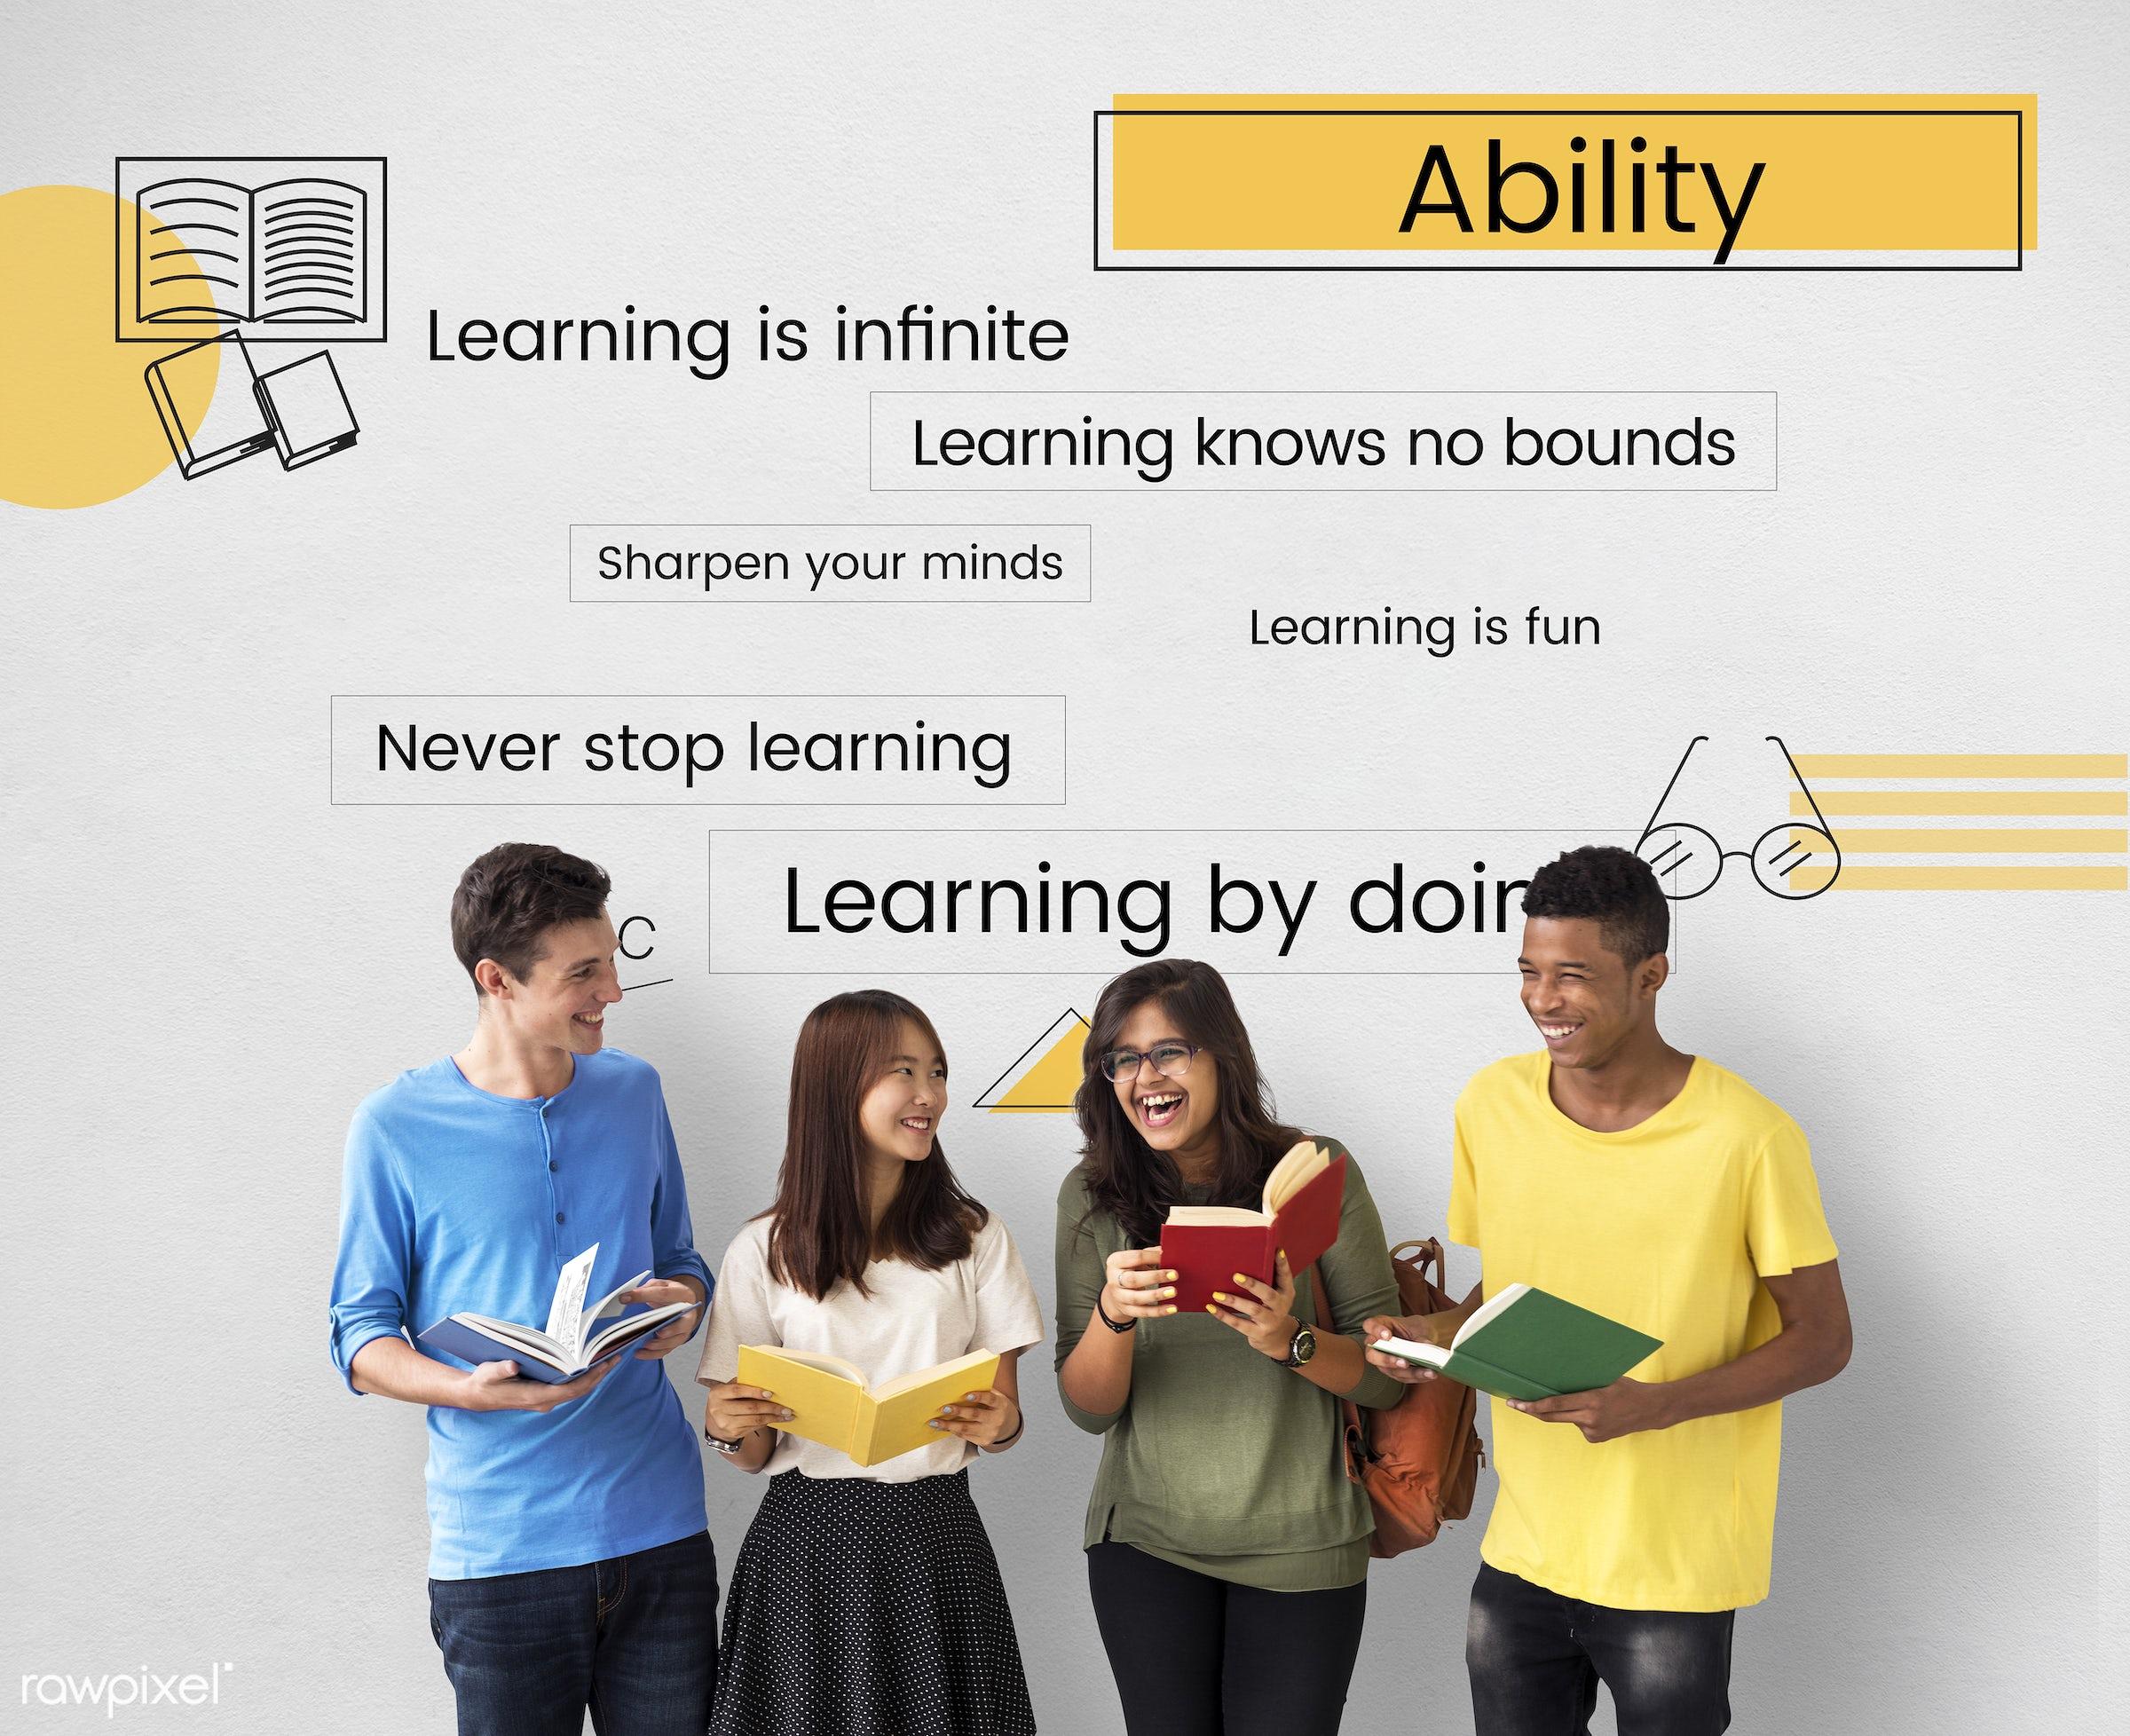 development, ability, academics, african descent, asian, book, caucasian, diversity, e-learning, education, enjoyment,...